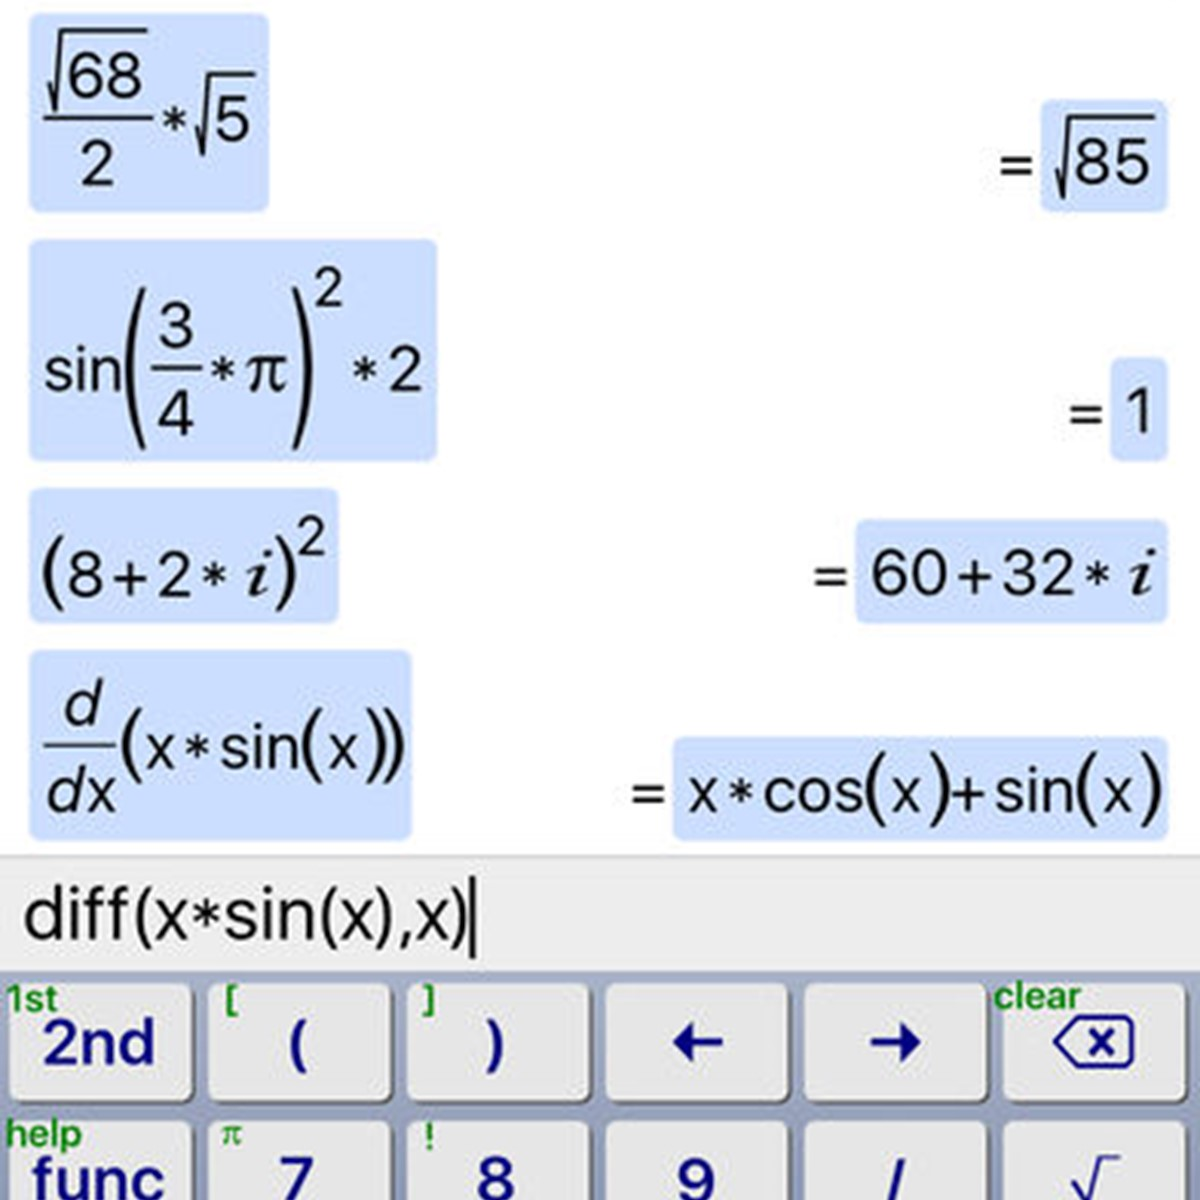 Symcalc Symbolic Calculator Alternatives And Similar Apps